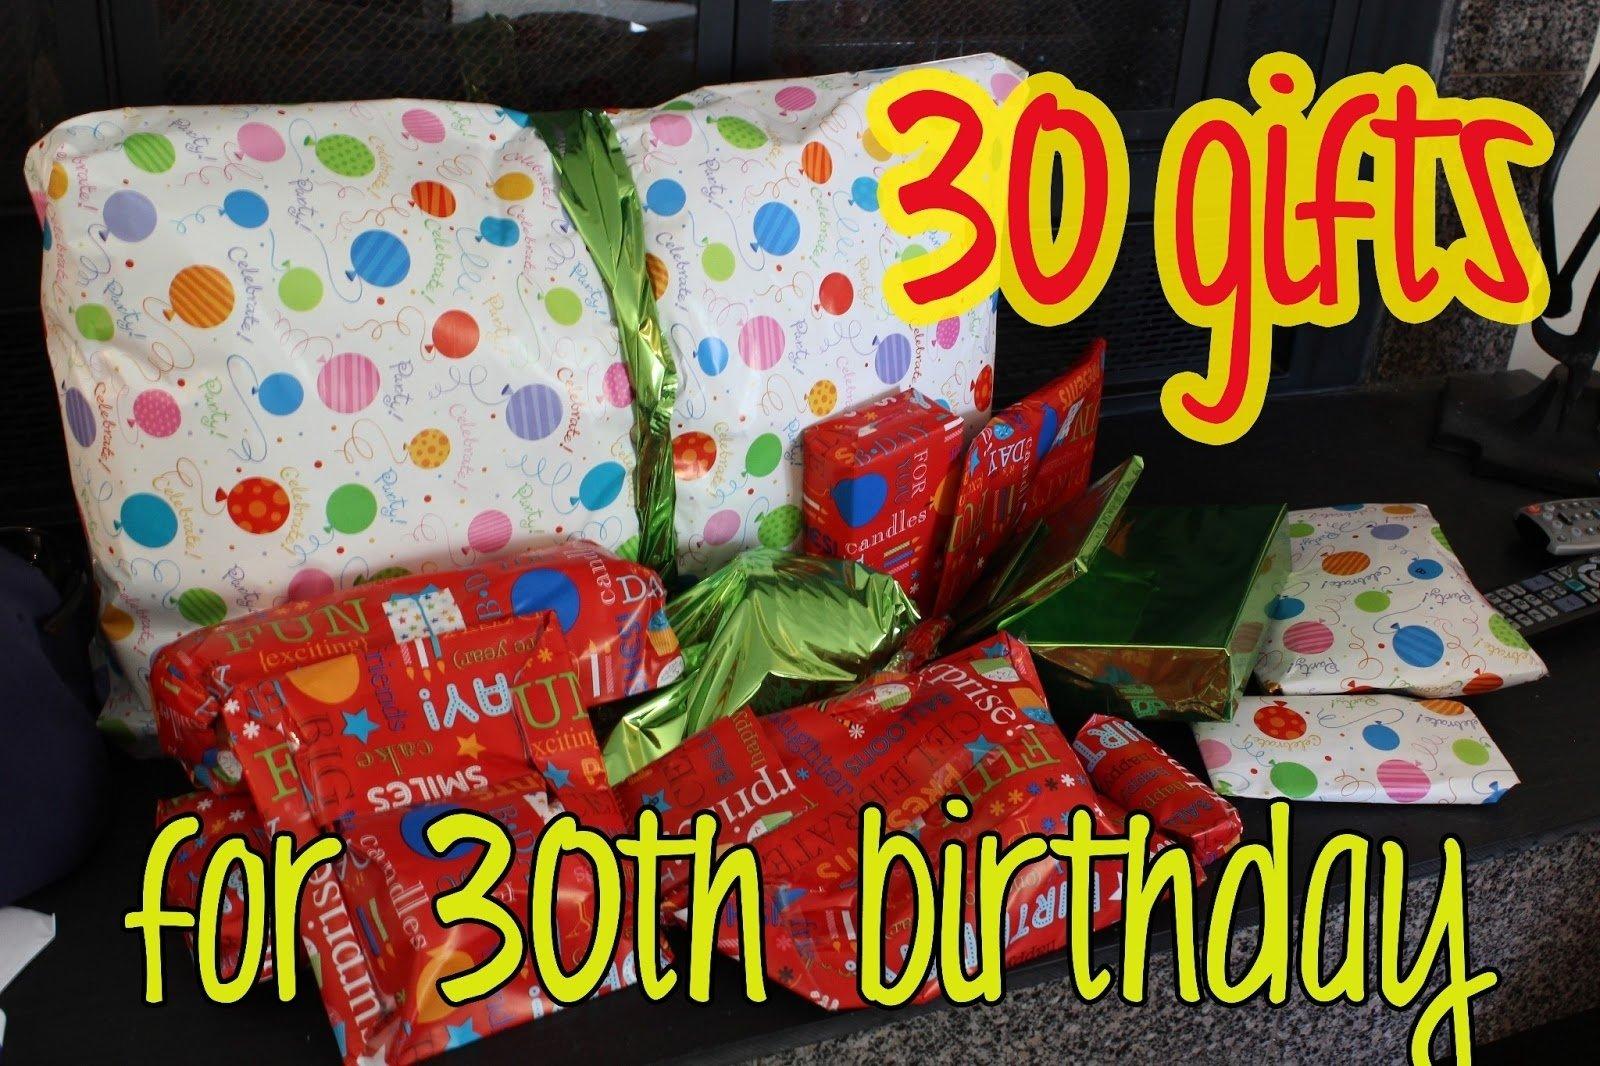 10 Stylish Birthday Ideas For Turning 30 love elizabethany gift idea 30 gifts for 30th birthday 9 2020